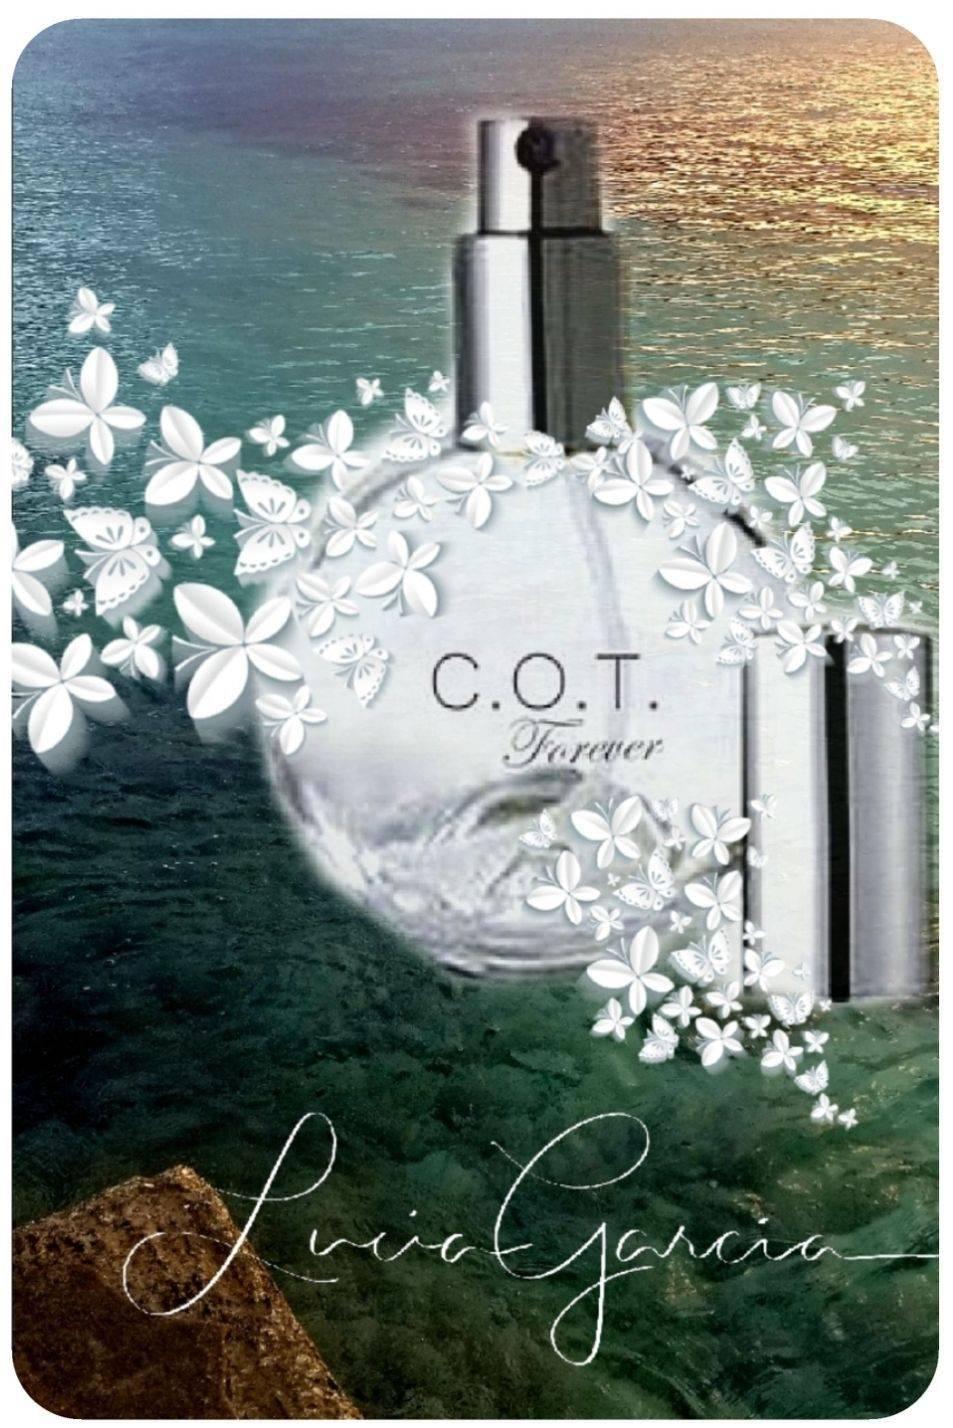 COT perfume